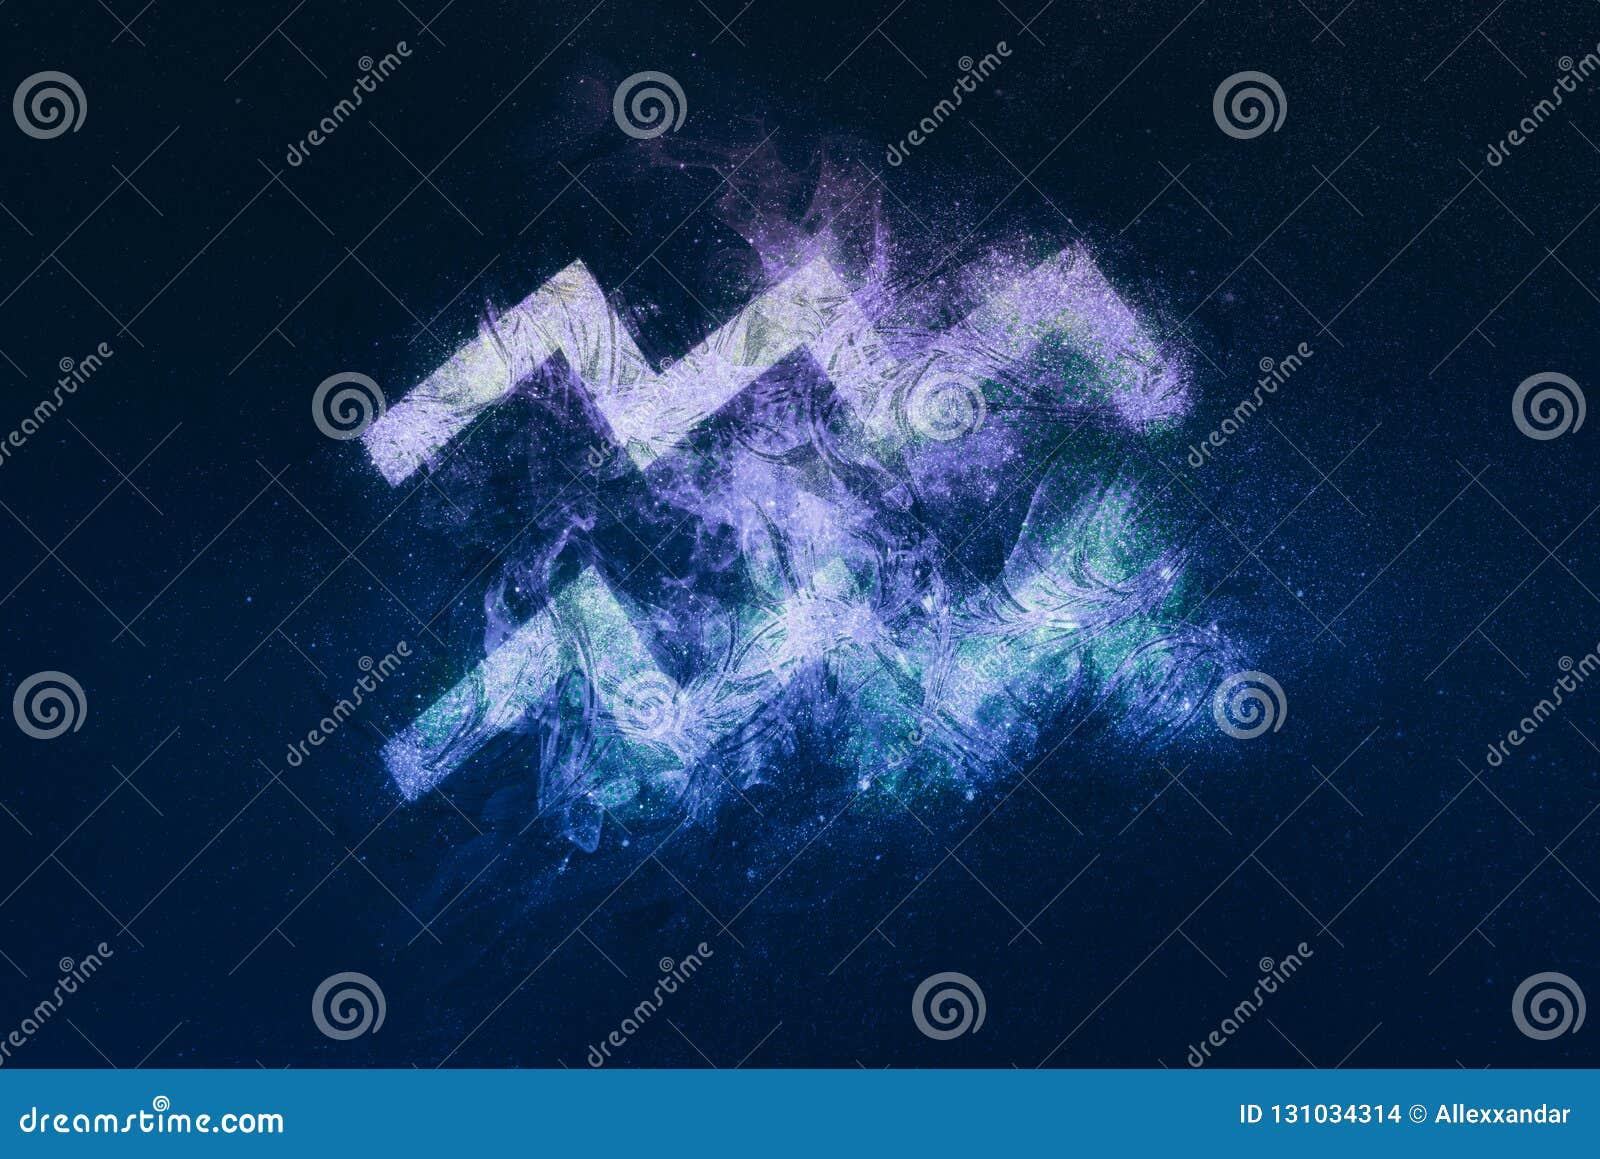 Aquarius Zodiac Sign. Night sky background